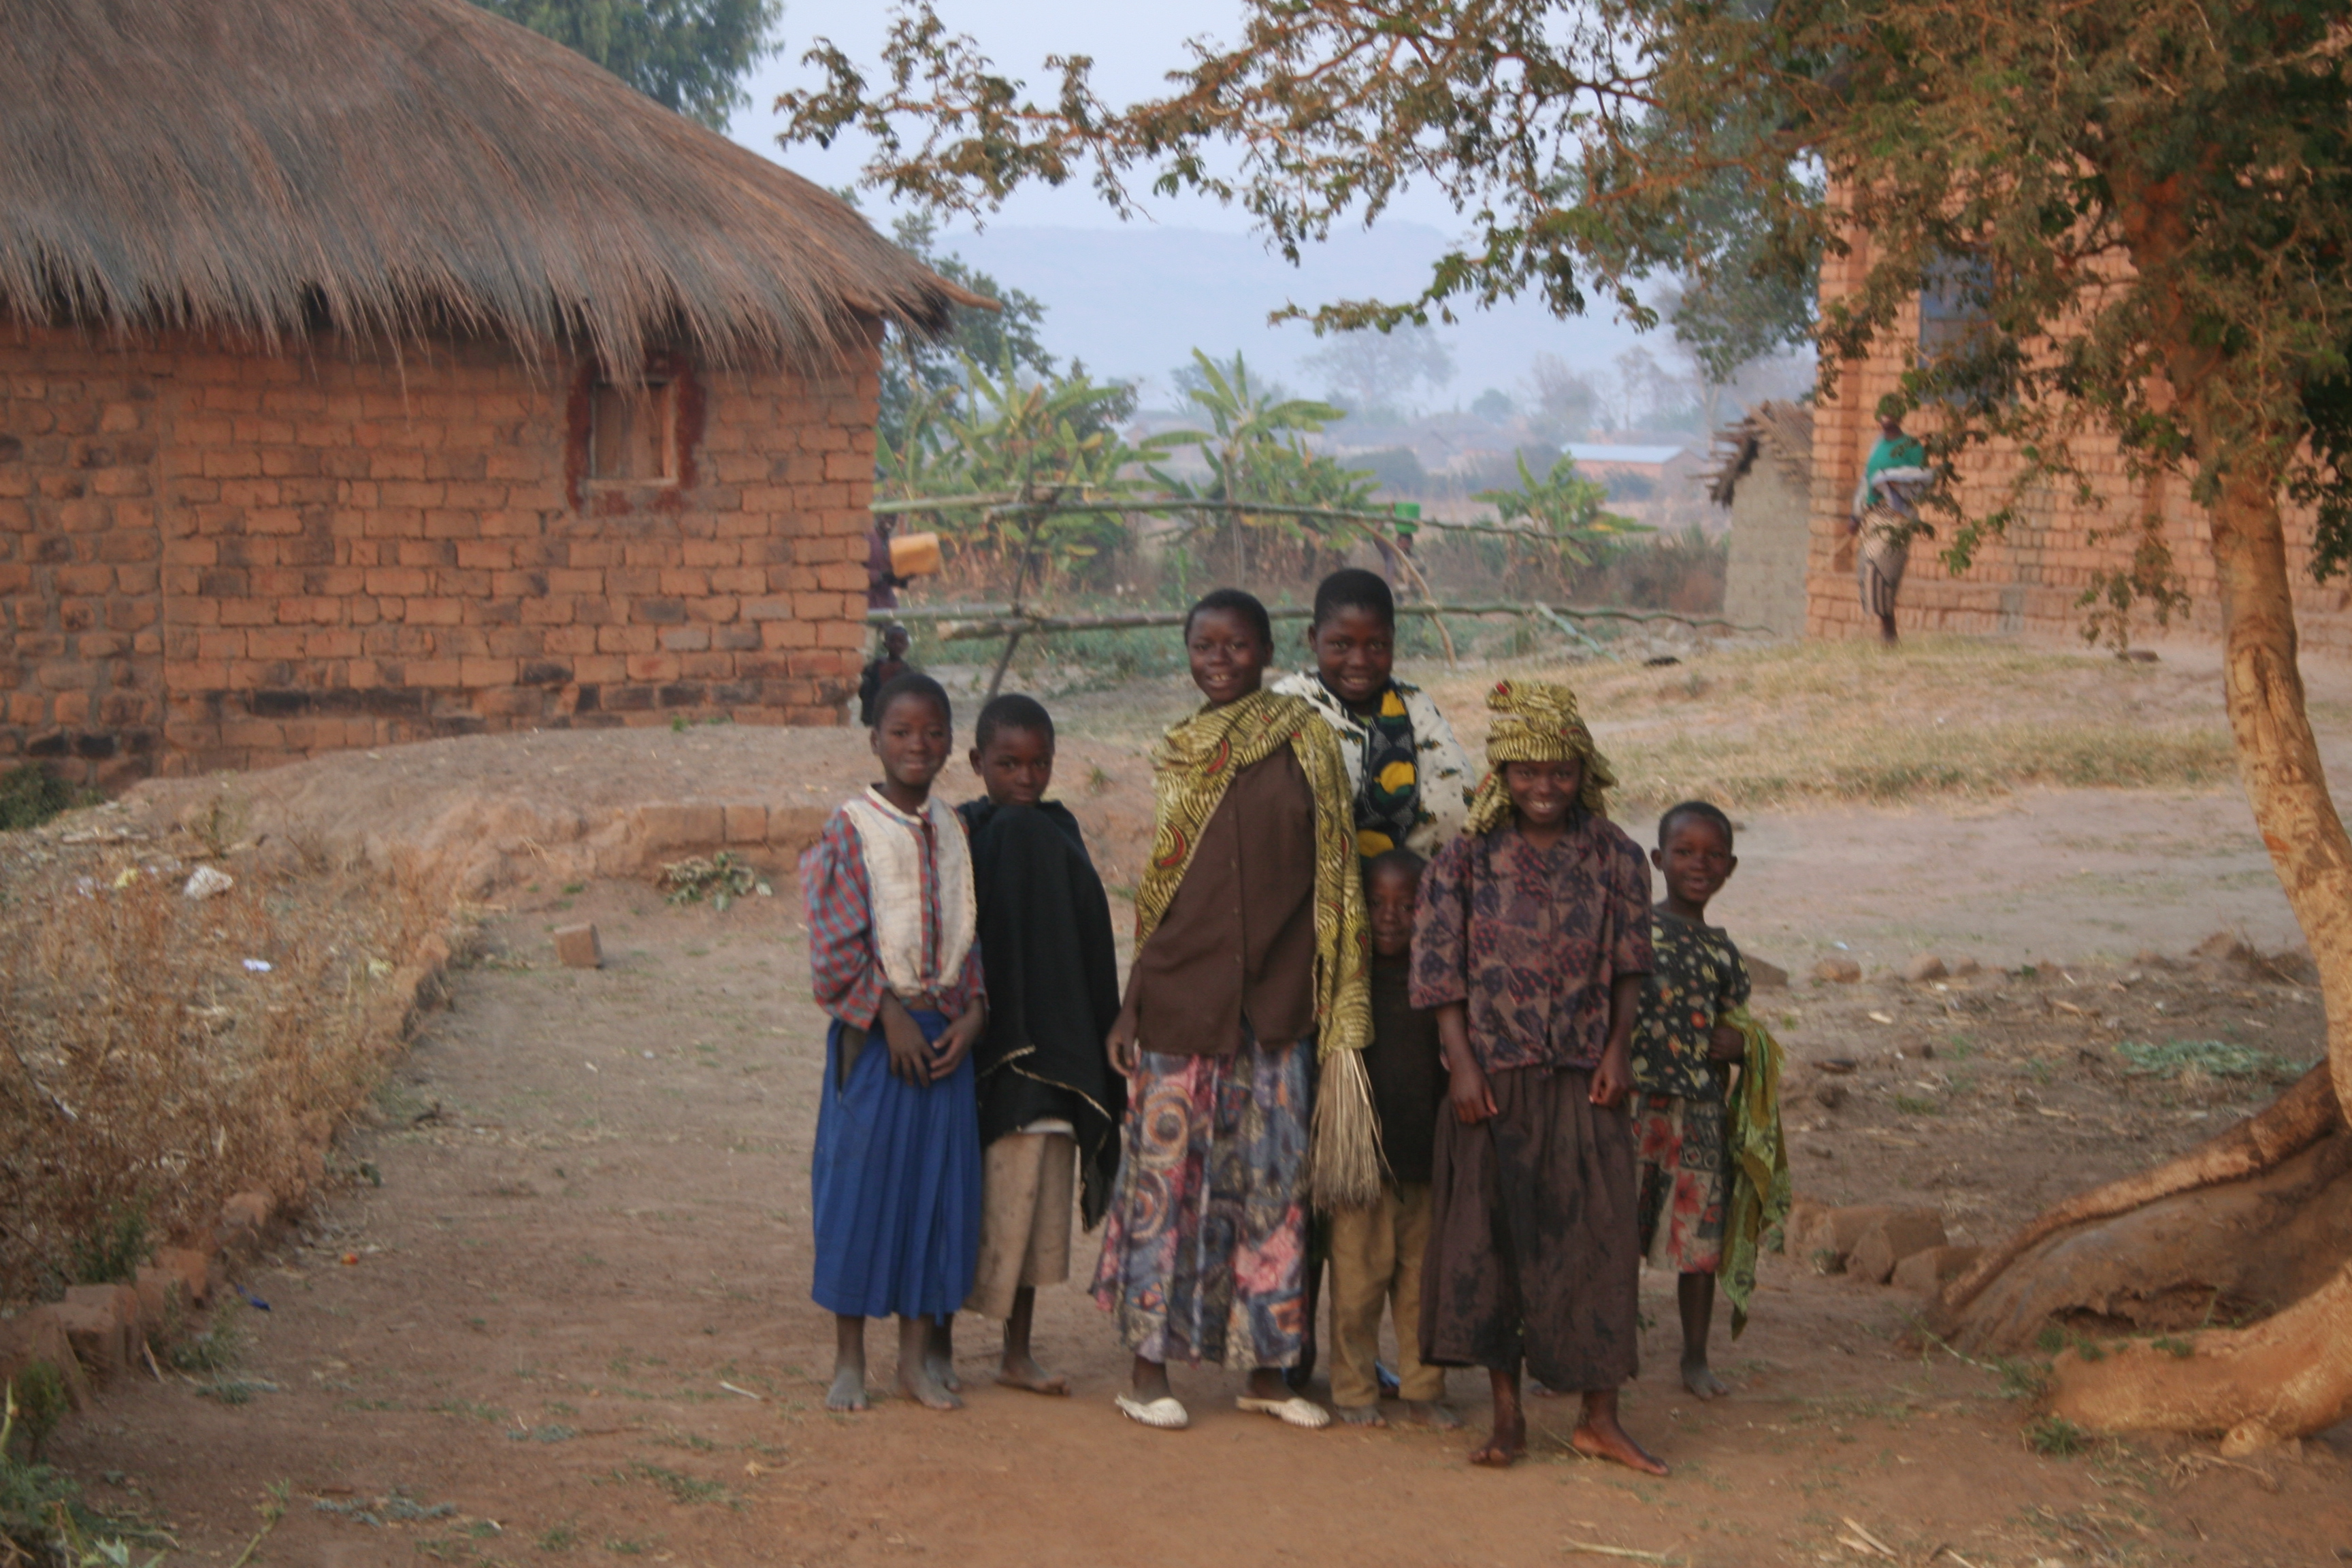 Villagers in Tanzania.